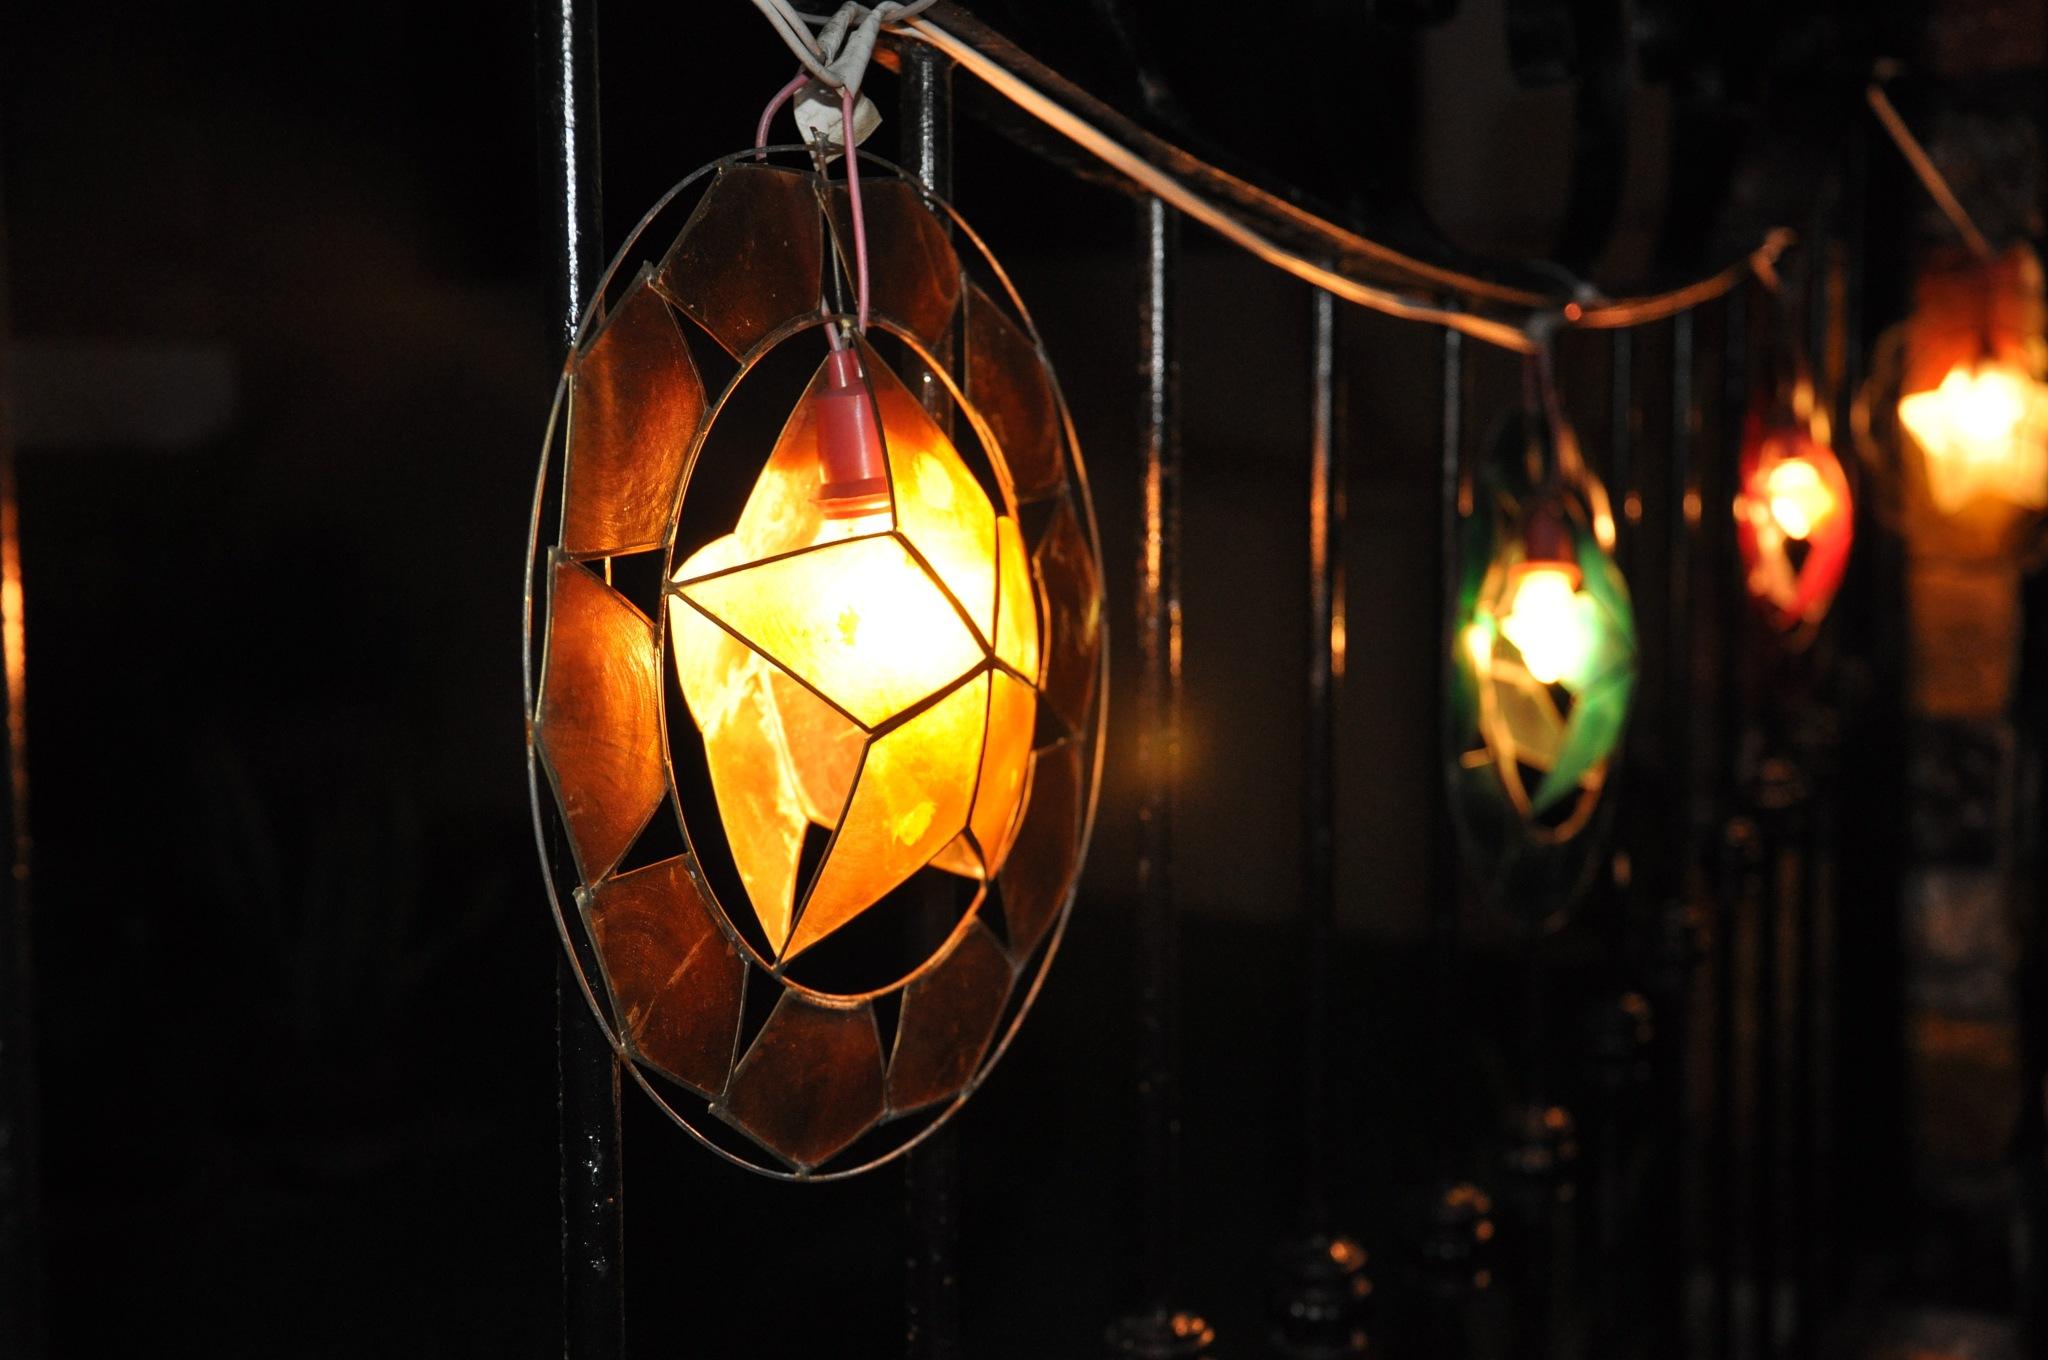 Lantern by Super_M